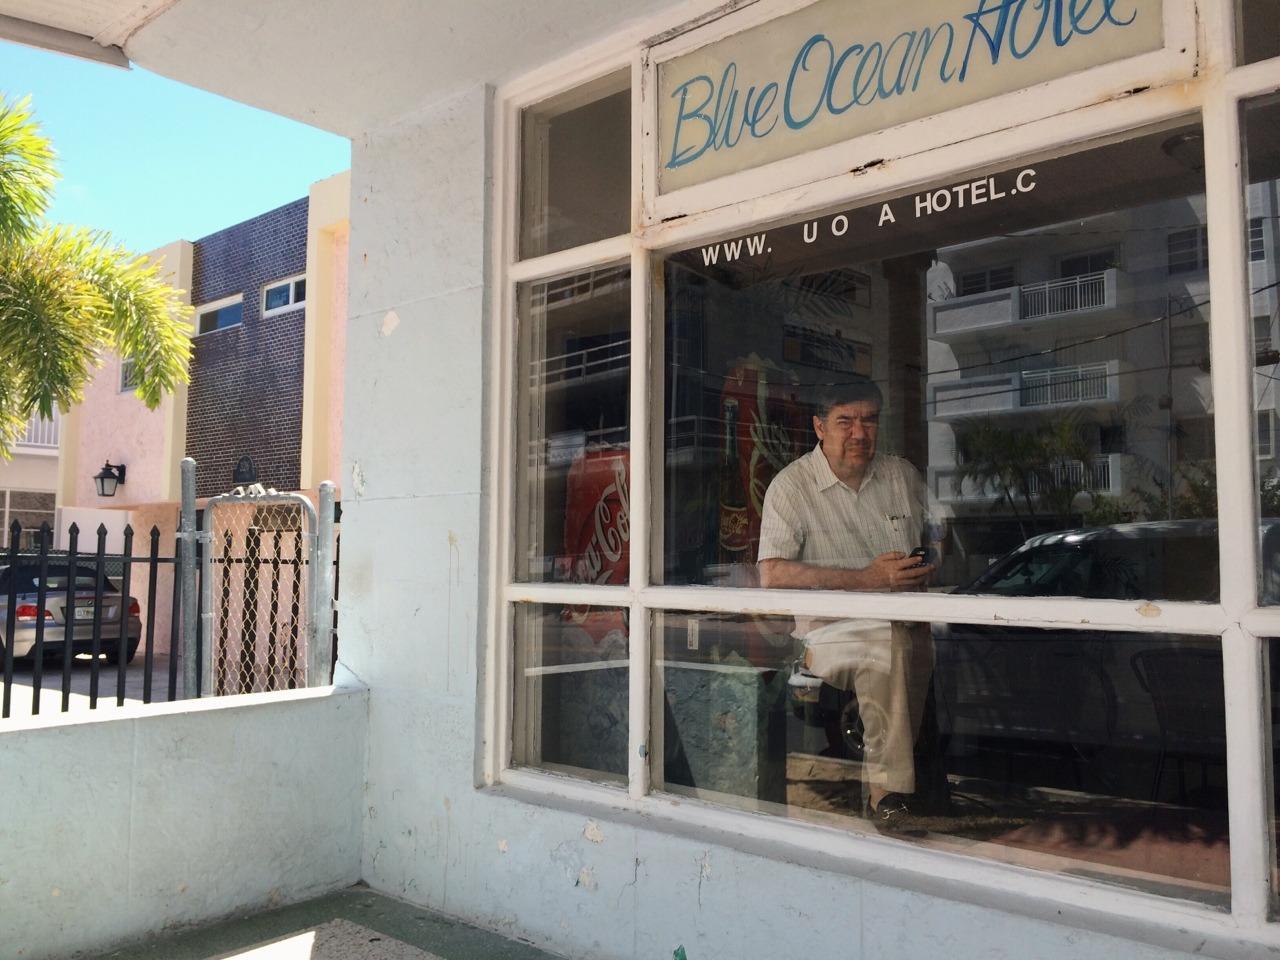 Blue Ocean Hotel #Miami